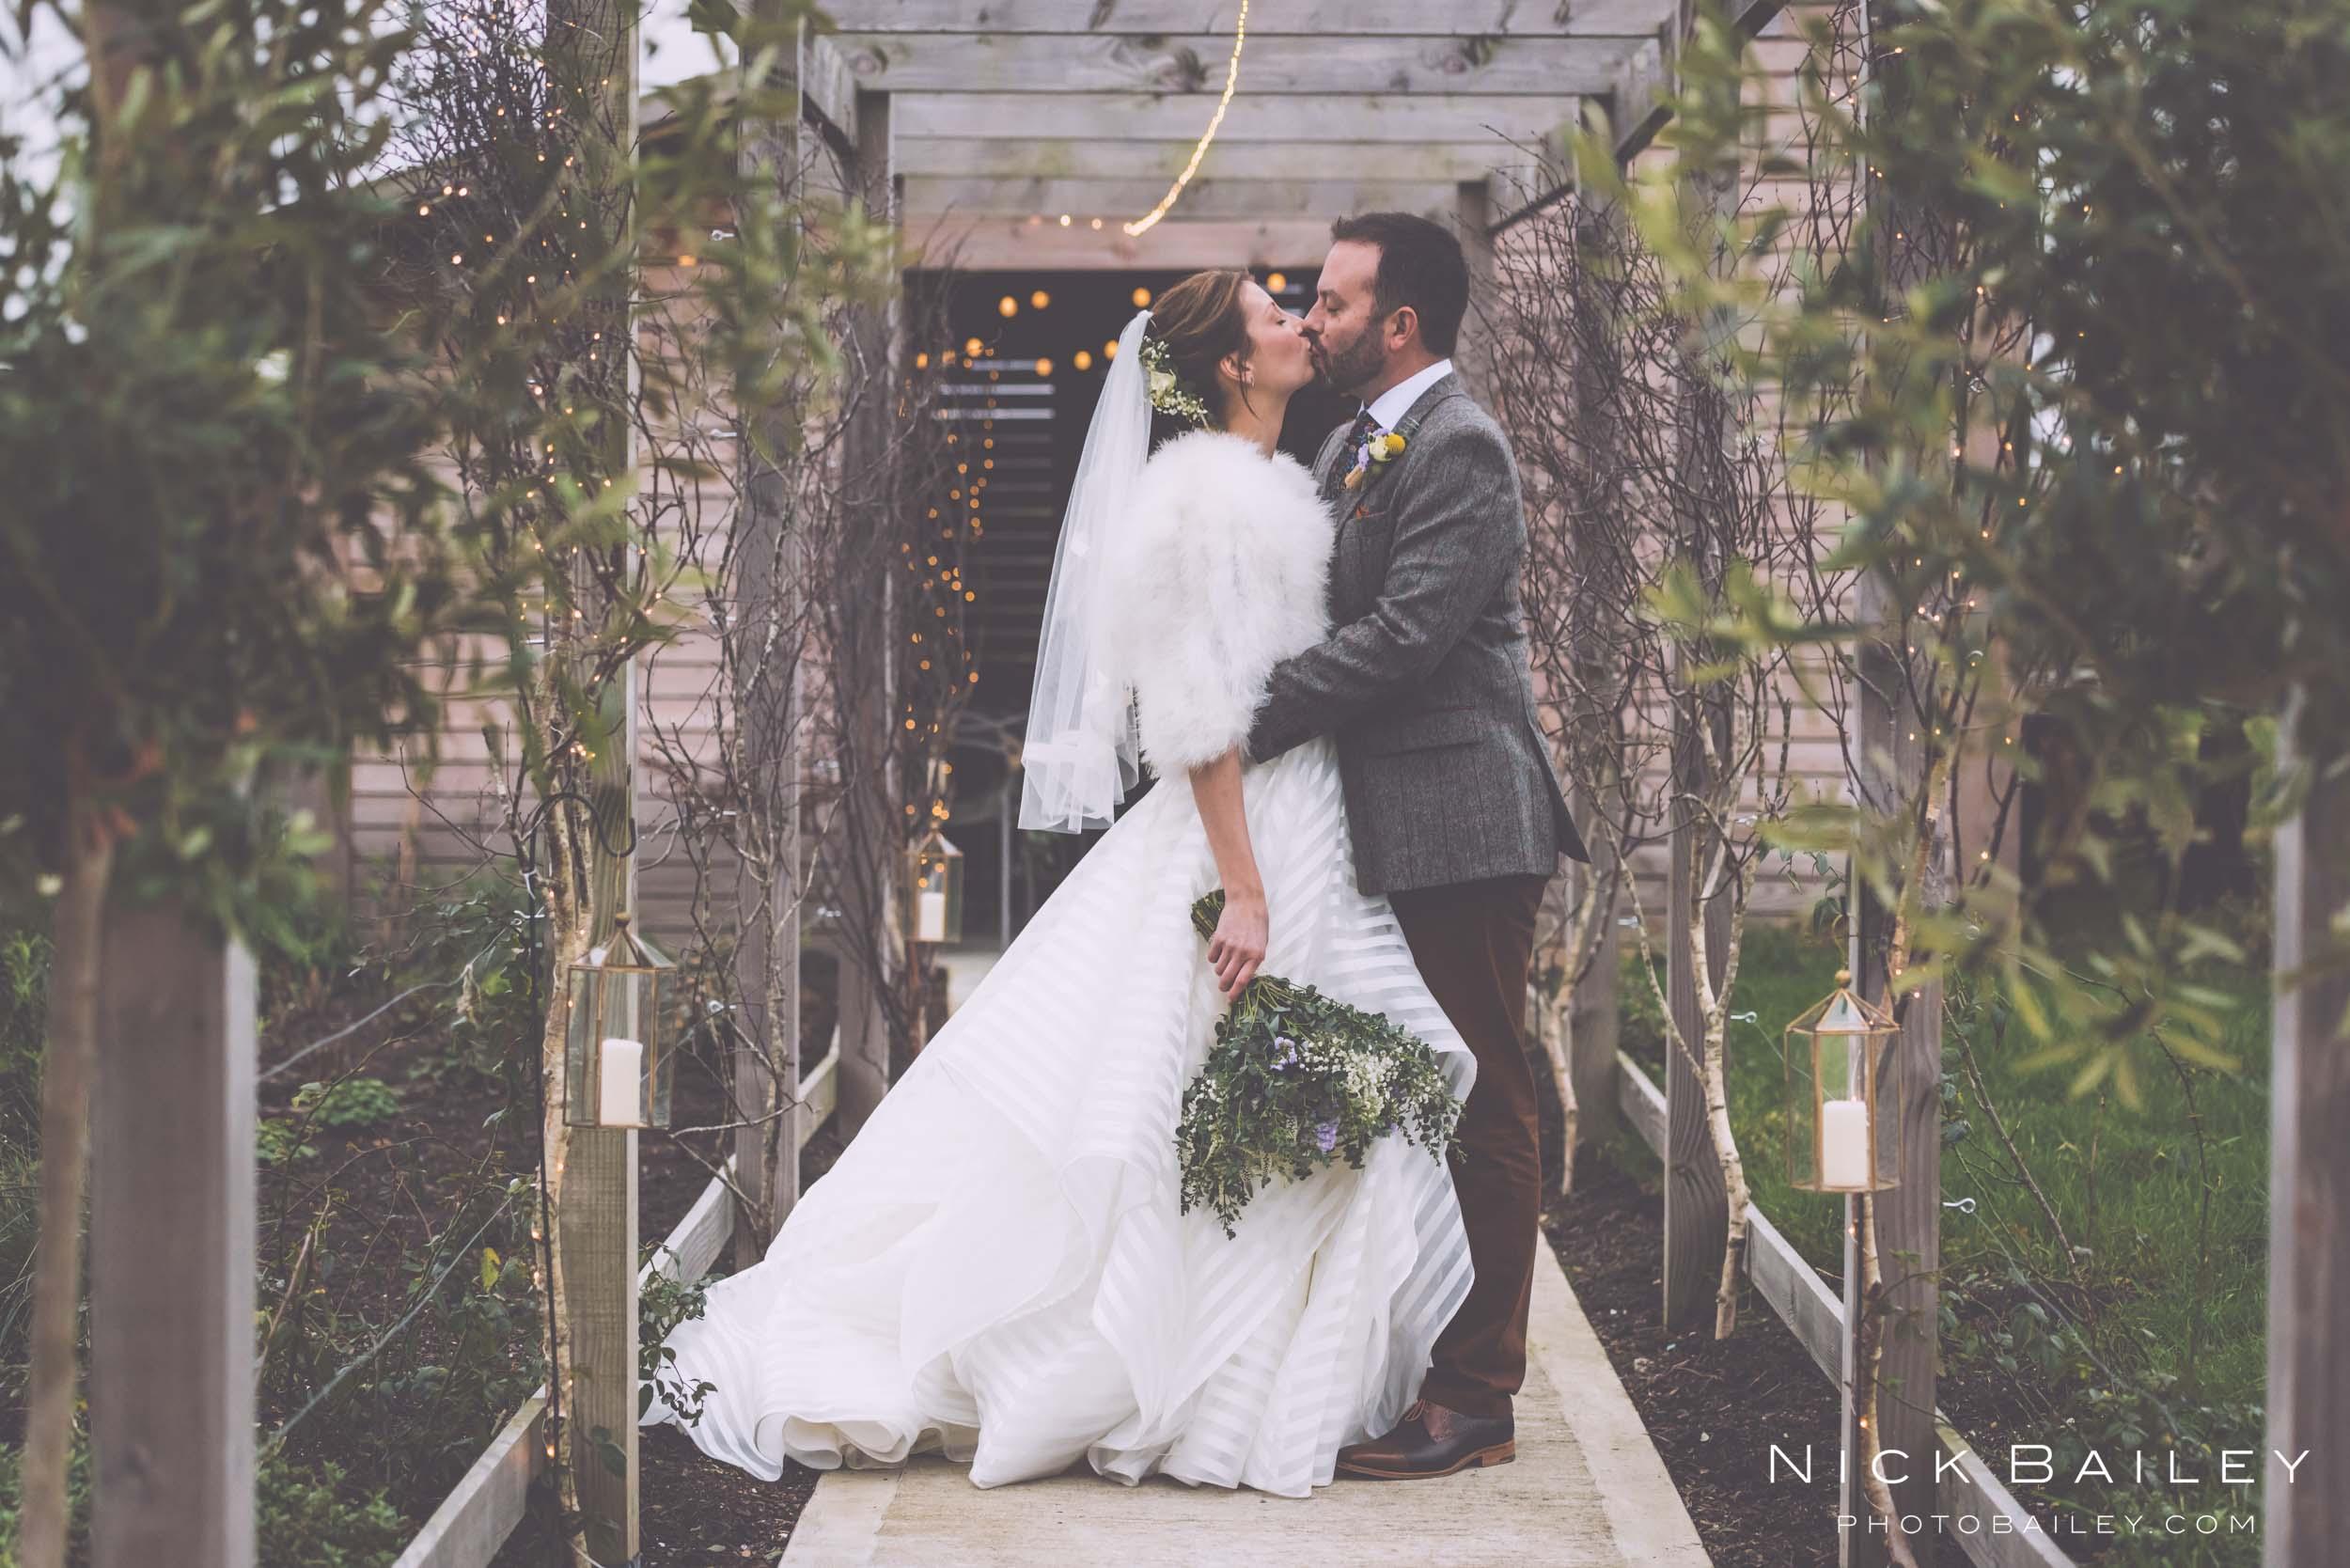 trevibban-mill-wedding-71.jpg